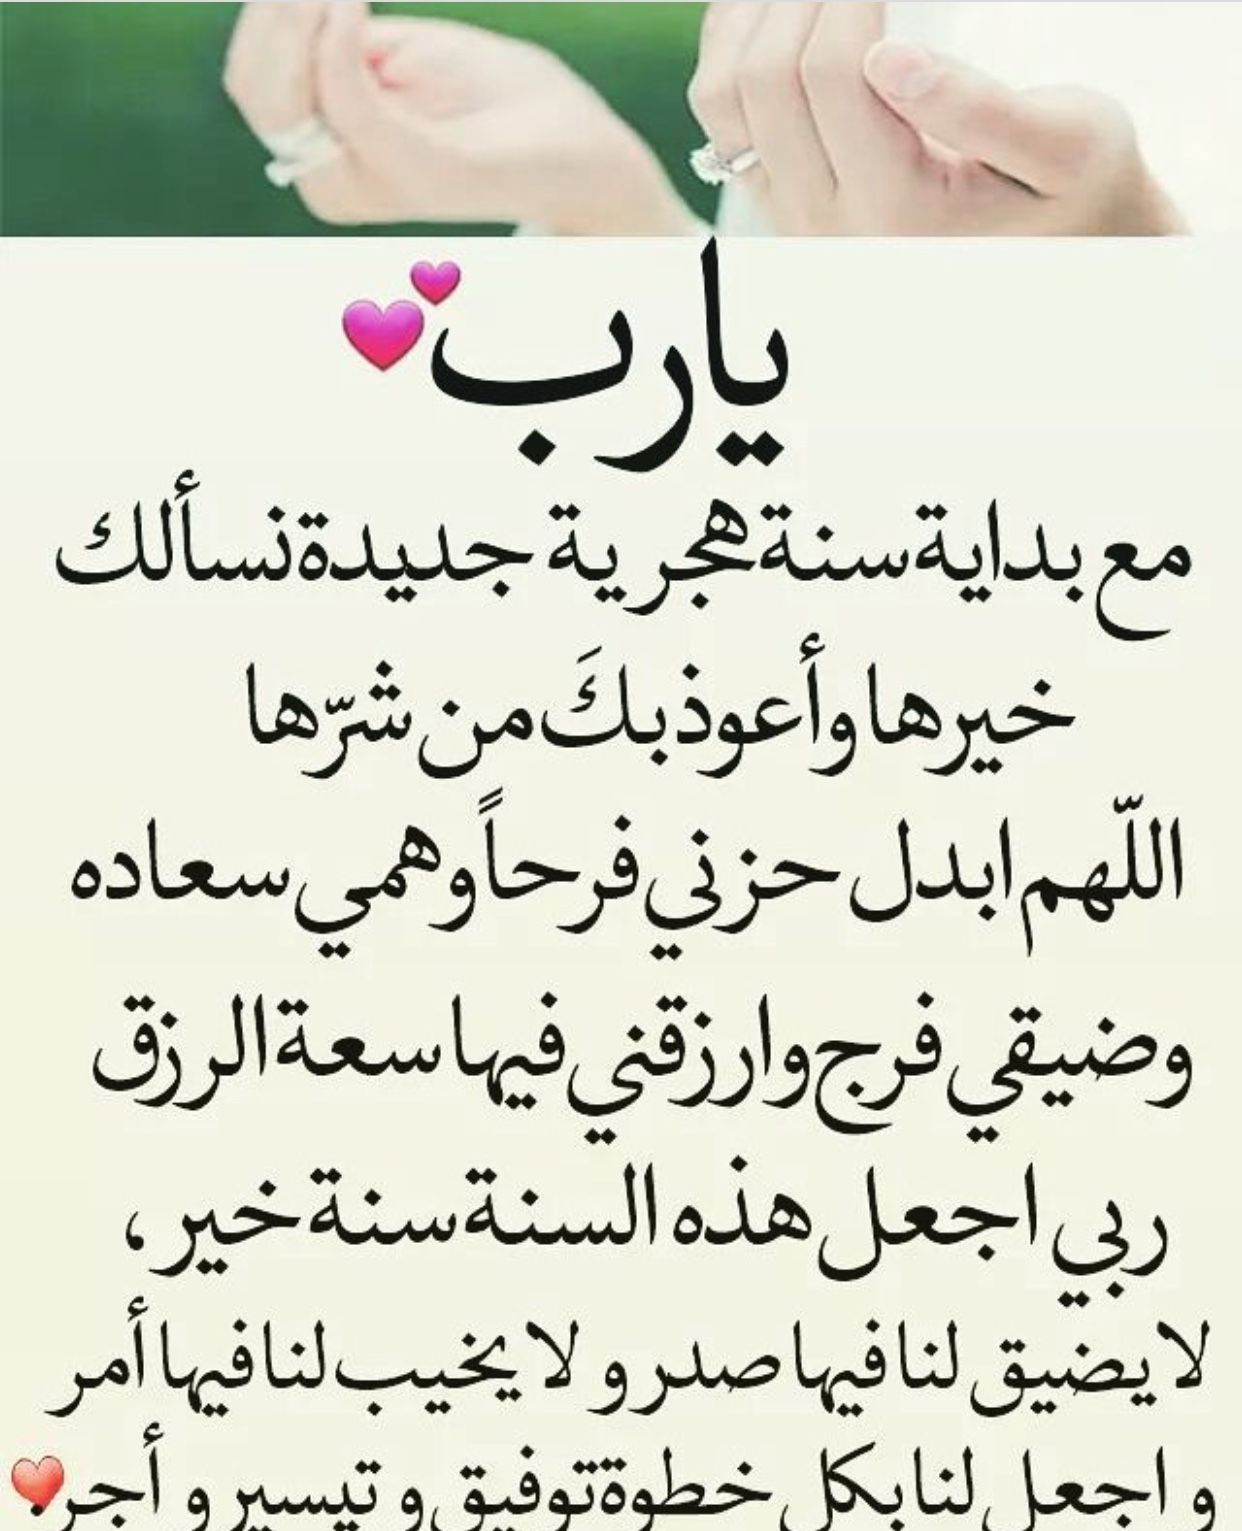 Pin By بنت محمد On يارب Arabic Calligraphy Calligraphy Arabic